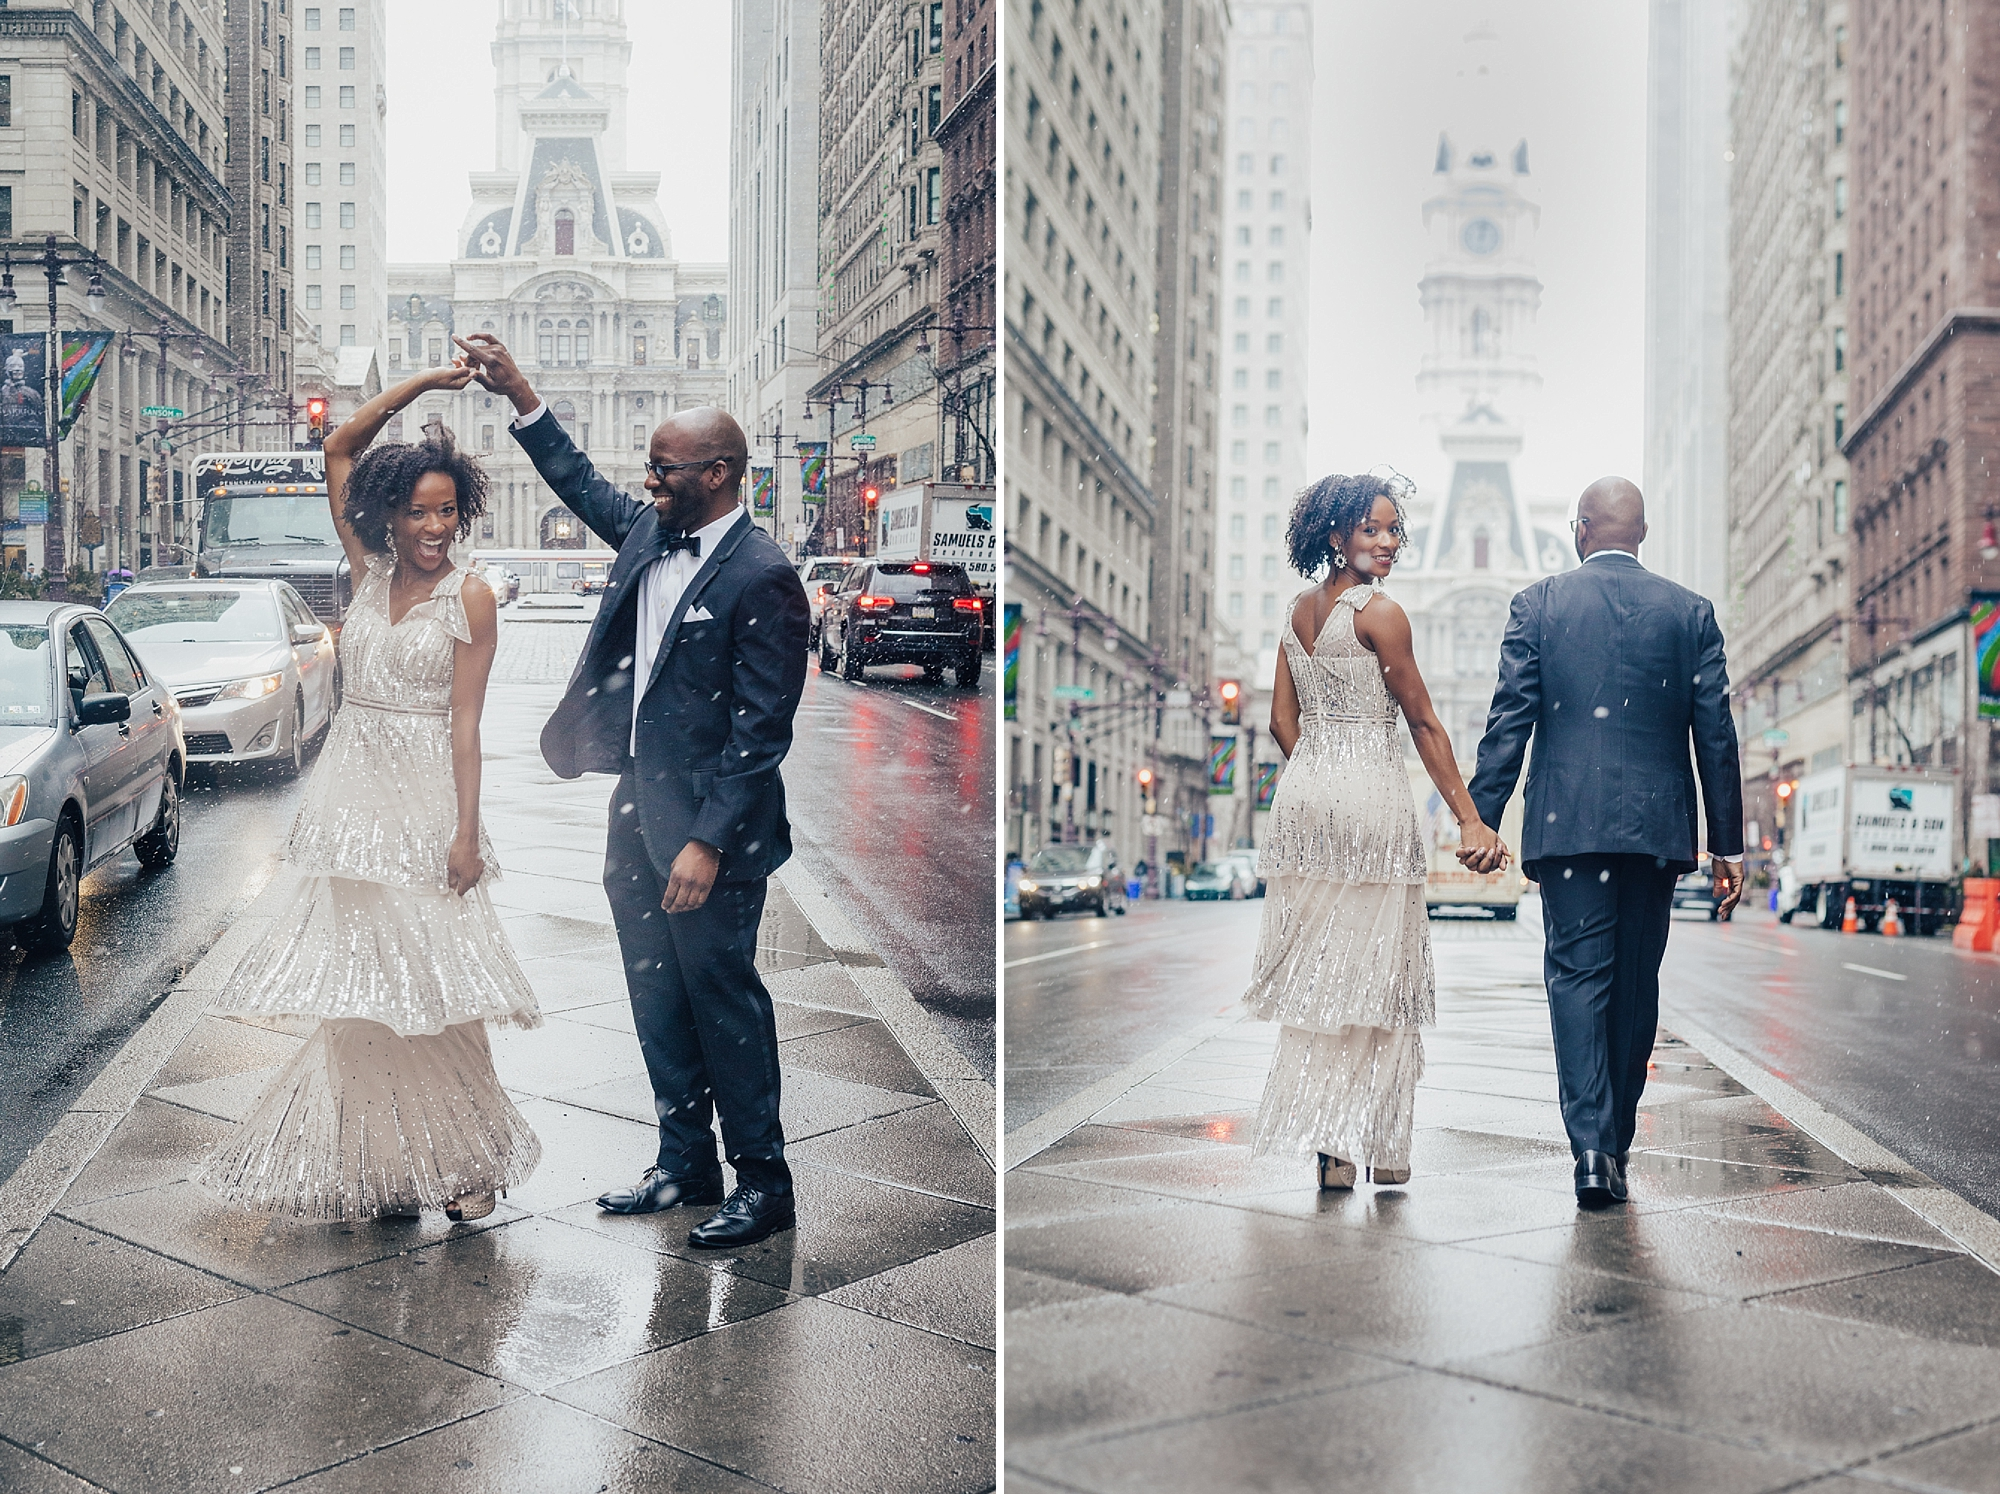 Joe_Mac_Creative_Vida_Fashionista_BHLDN_Bridal_Wedding_Fashion__0004.jpg